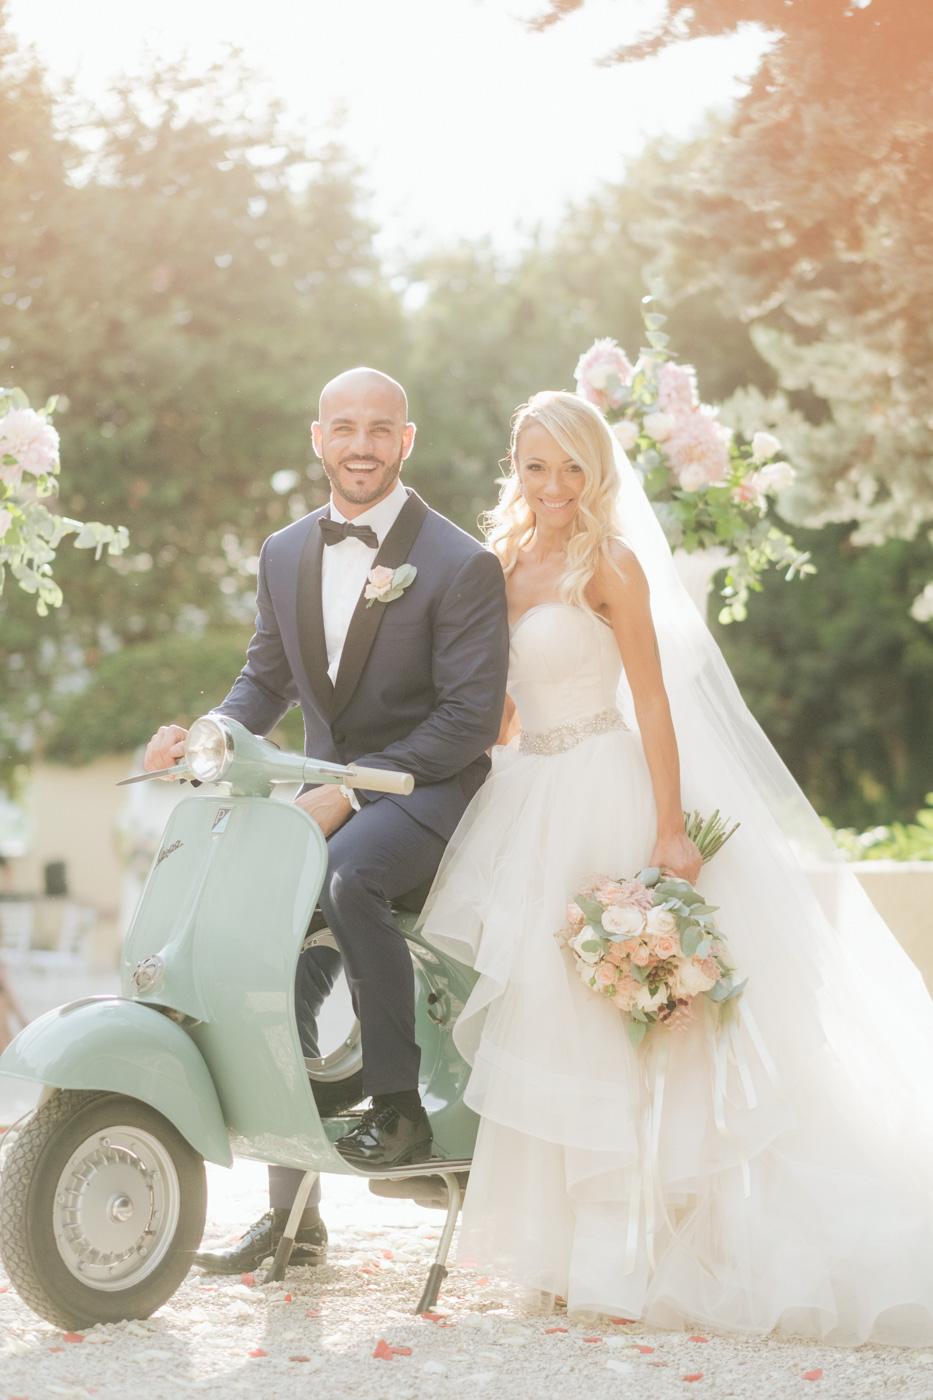 Matrimoni all'italiana wedding photographer italy-114.jpg